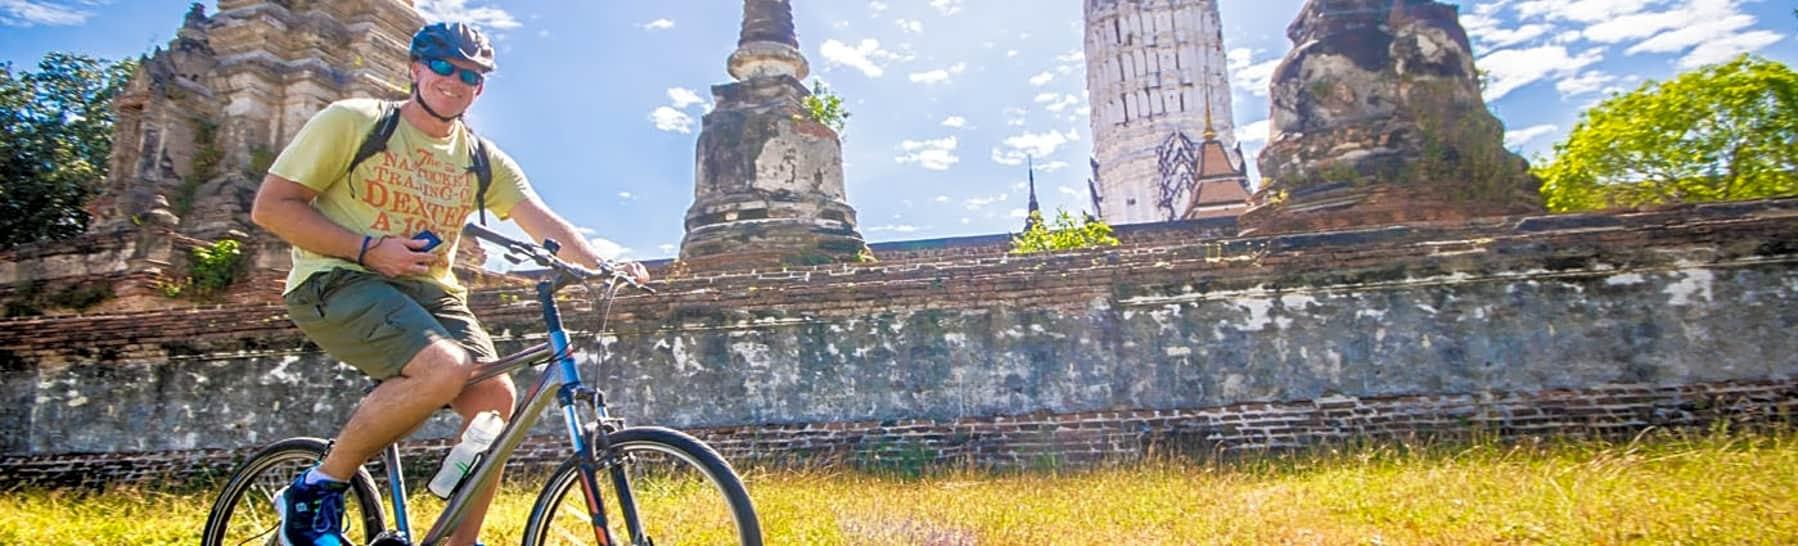 The Trip Guru 感受曼谷行程9折預訂優惠碼:第17張圖片